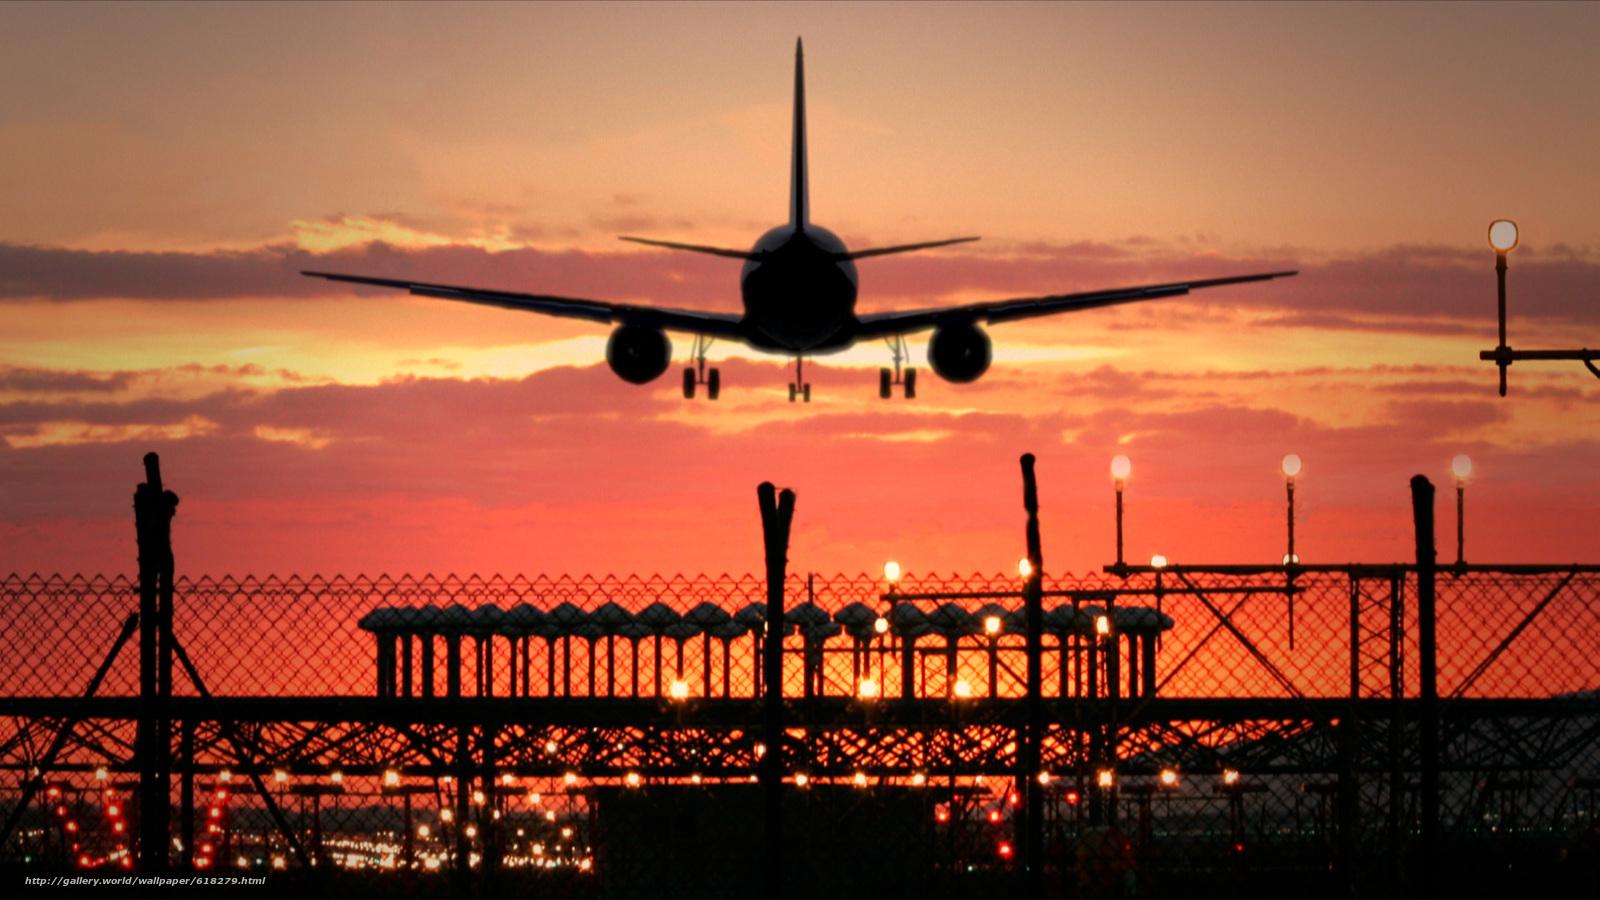 Скачать на телефон обои фото картинку на тему Посадка, МС-21, самолёт, аэропорт, авиация, небо, вечер, закат, разширение 1920x1080